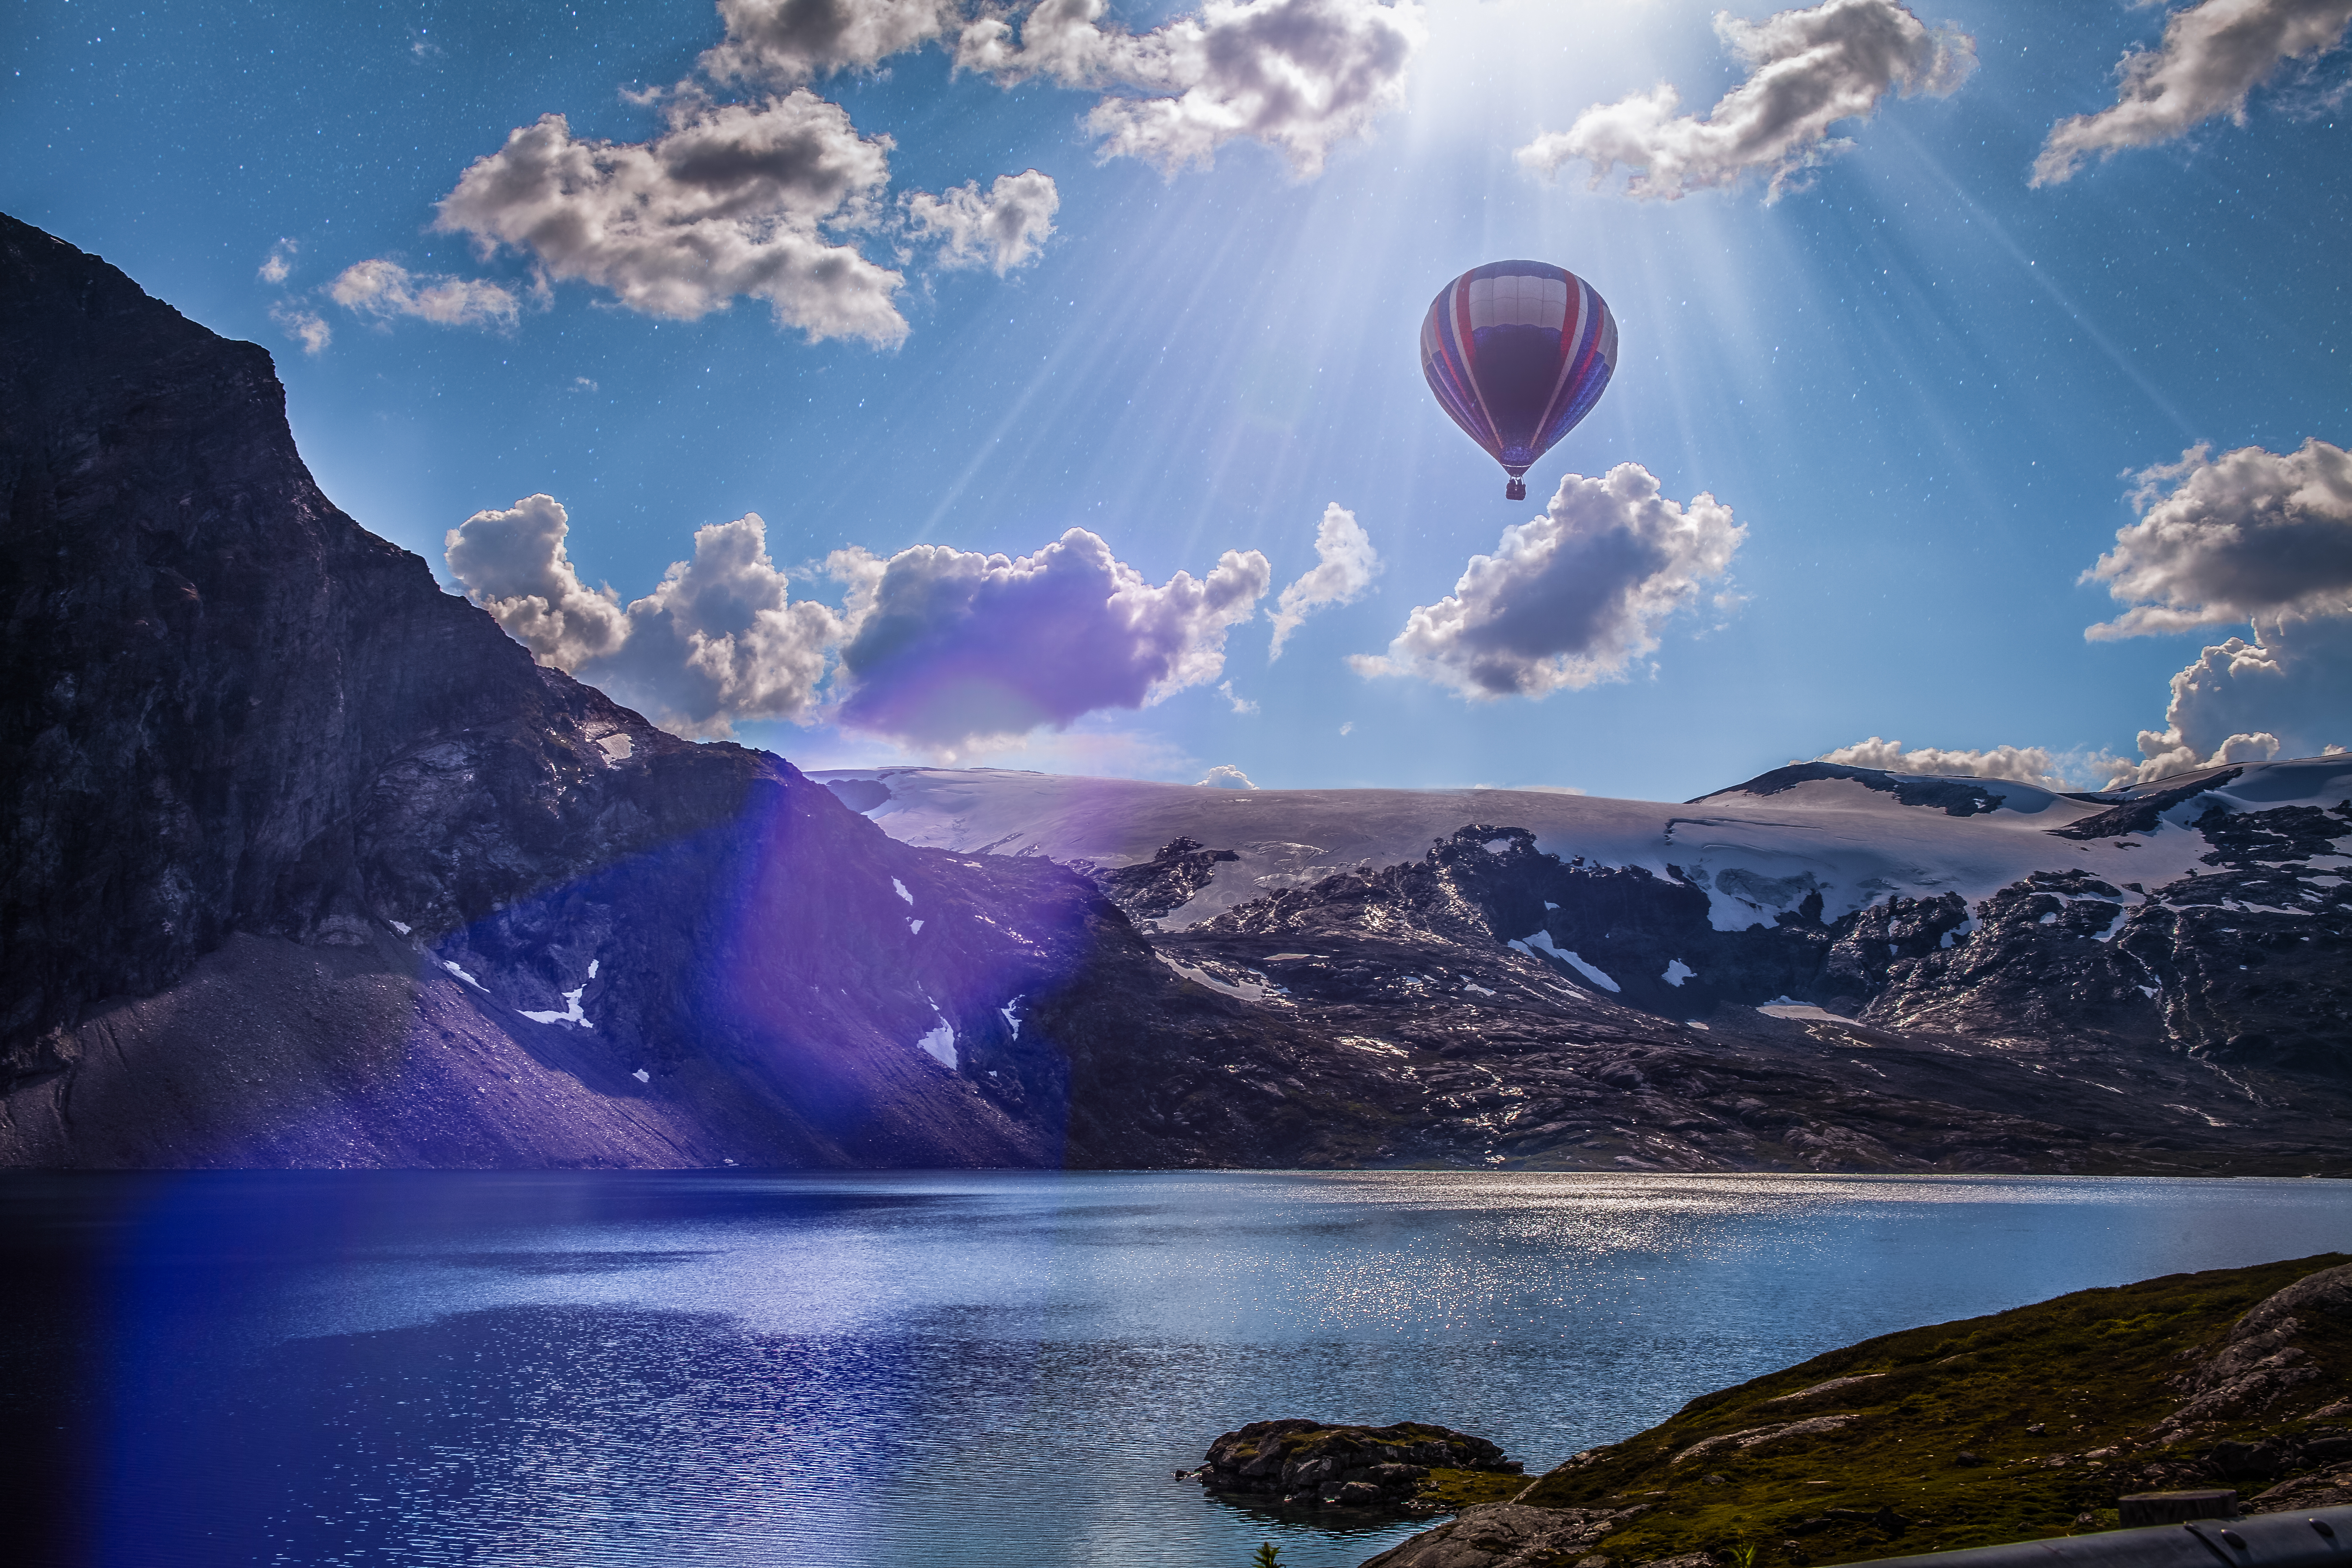 Hot air balloon 5k retina ultra hd wallpaper background image 5616x3744 id 600458 - Air wallpaper hd ...